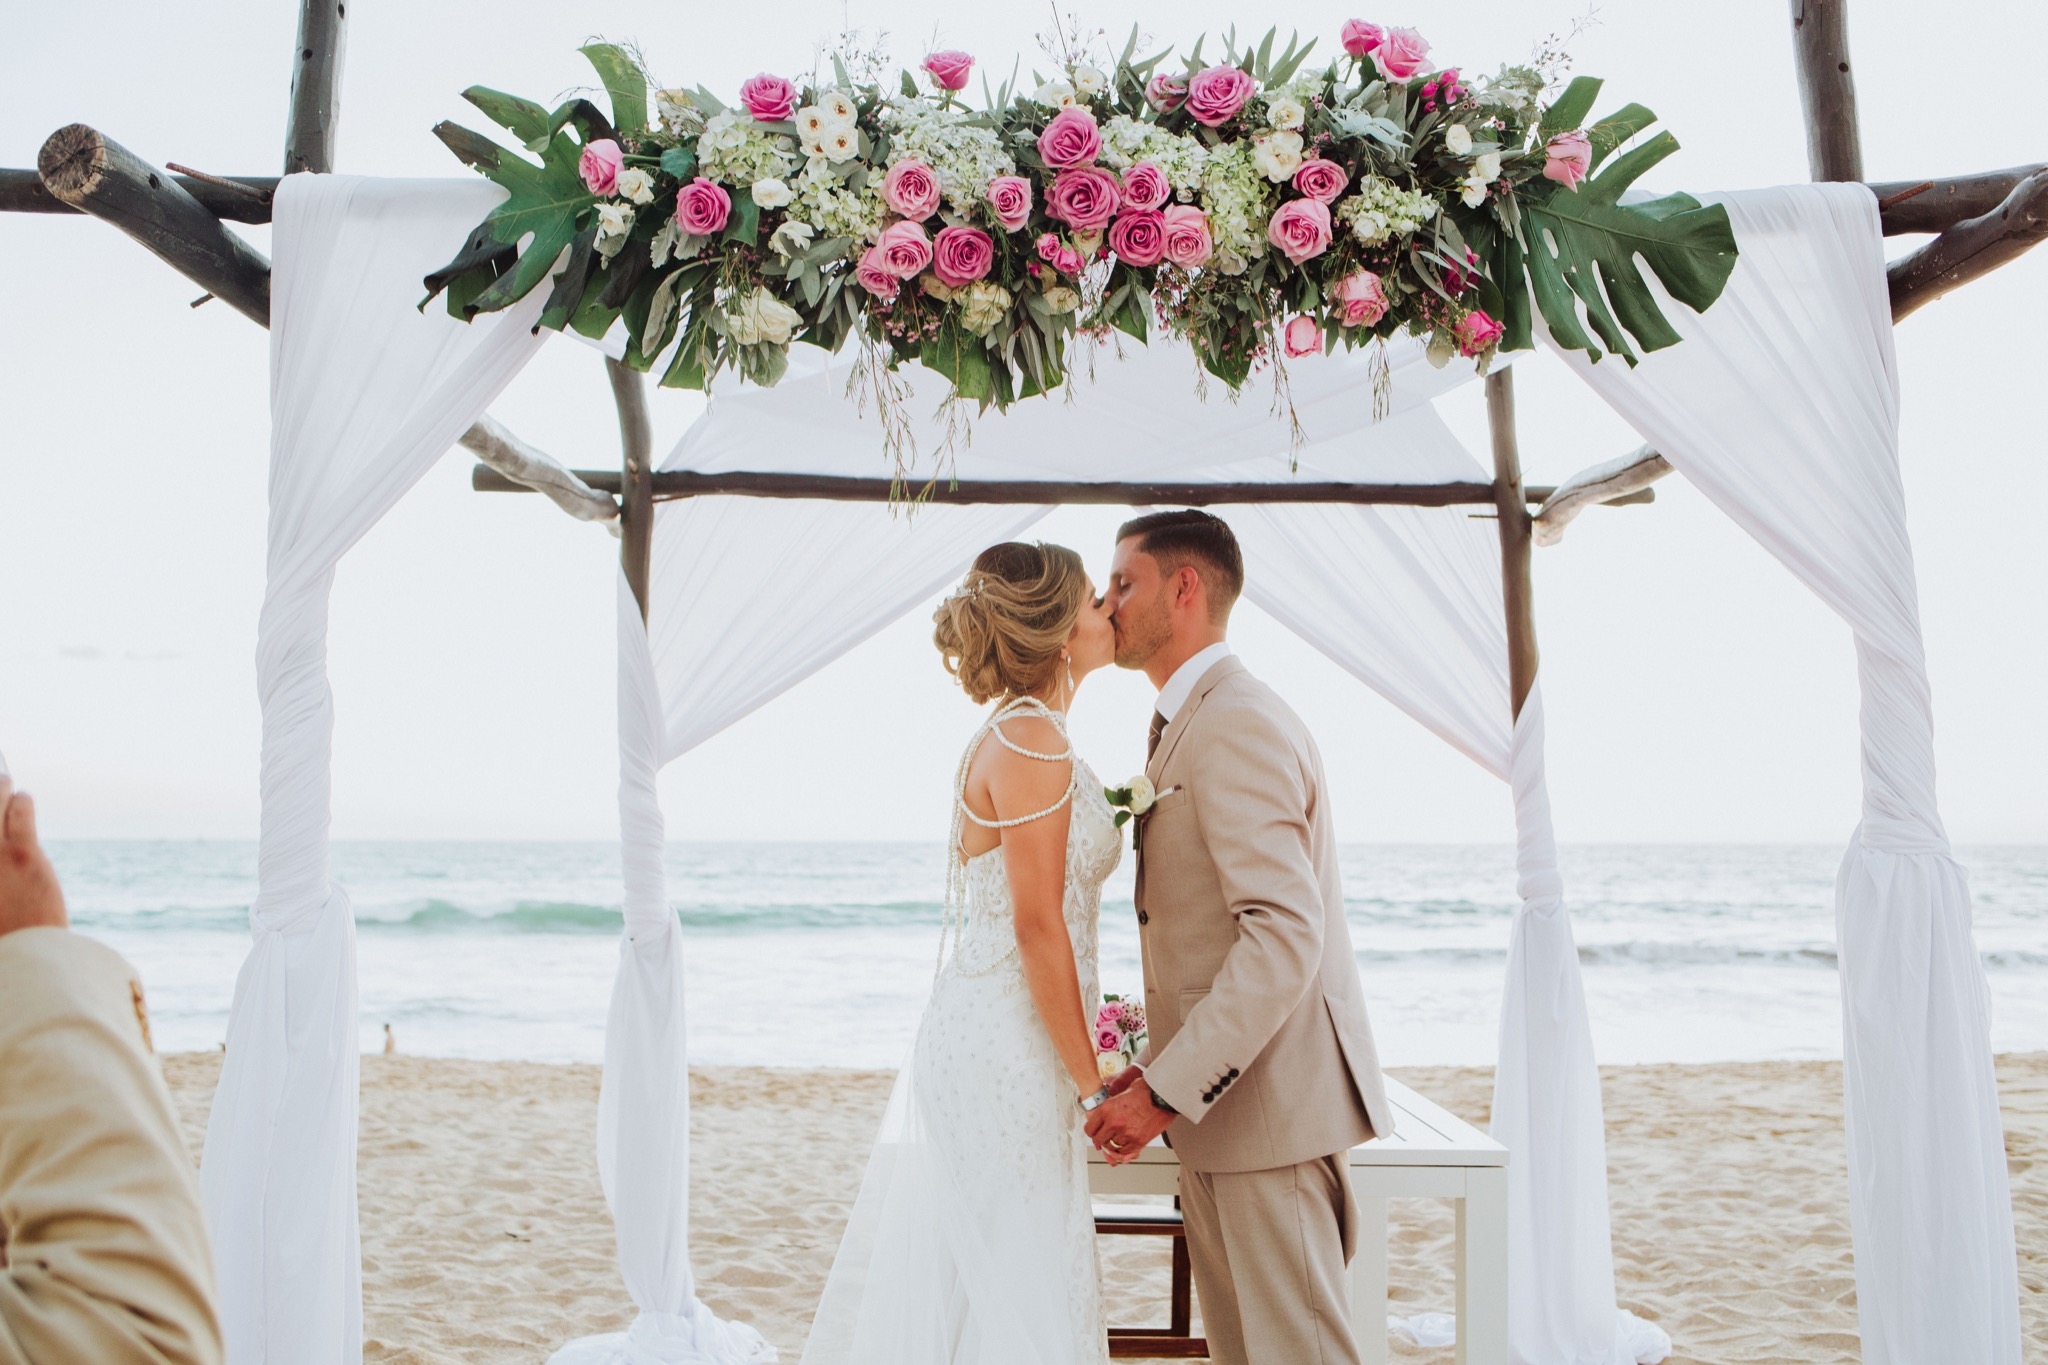 Javier_noriega_fotografo_bodas_profesional_zacatecas_mexico_mazatlan_sinaloa_photographer_weddings63